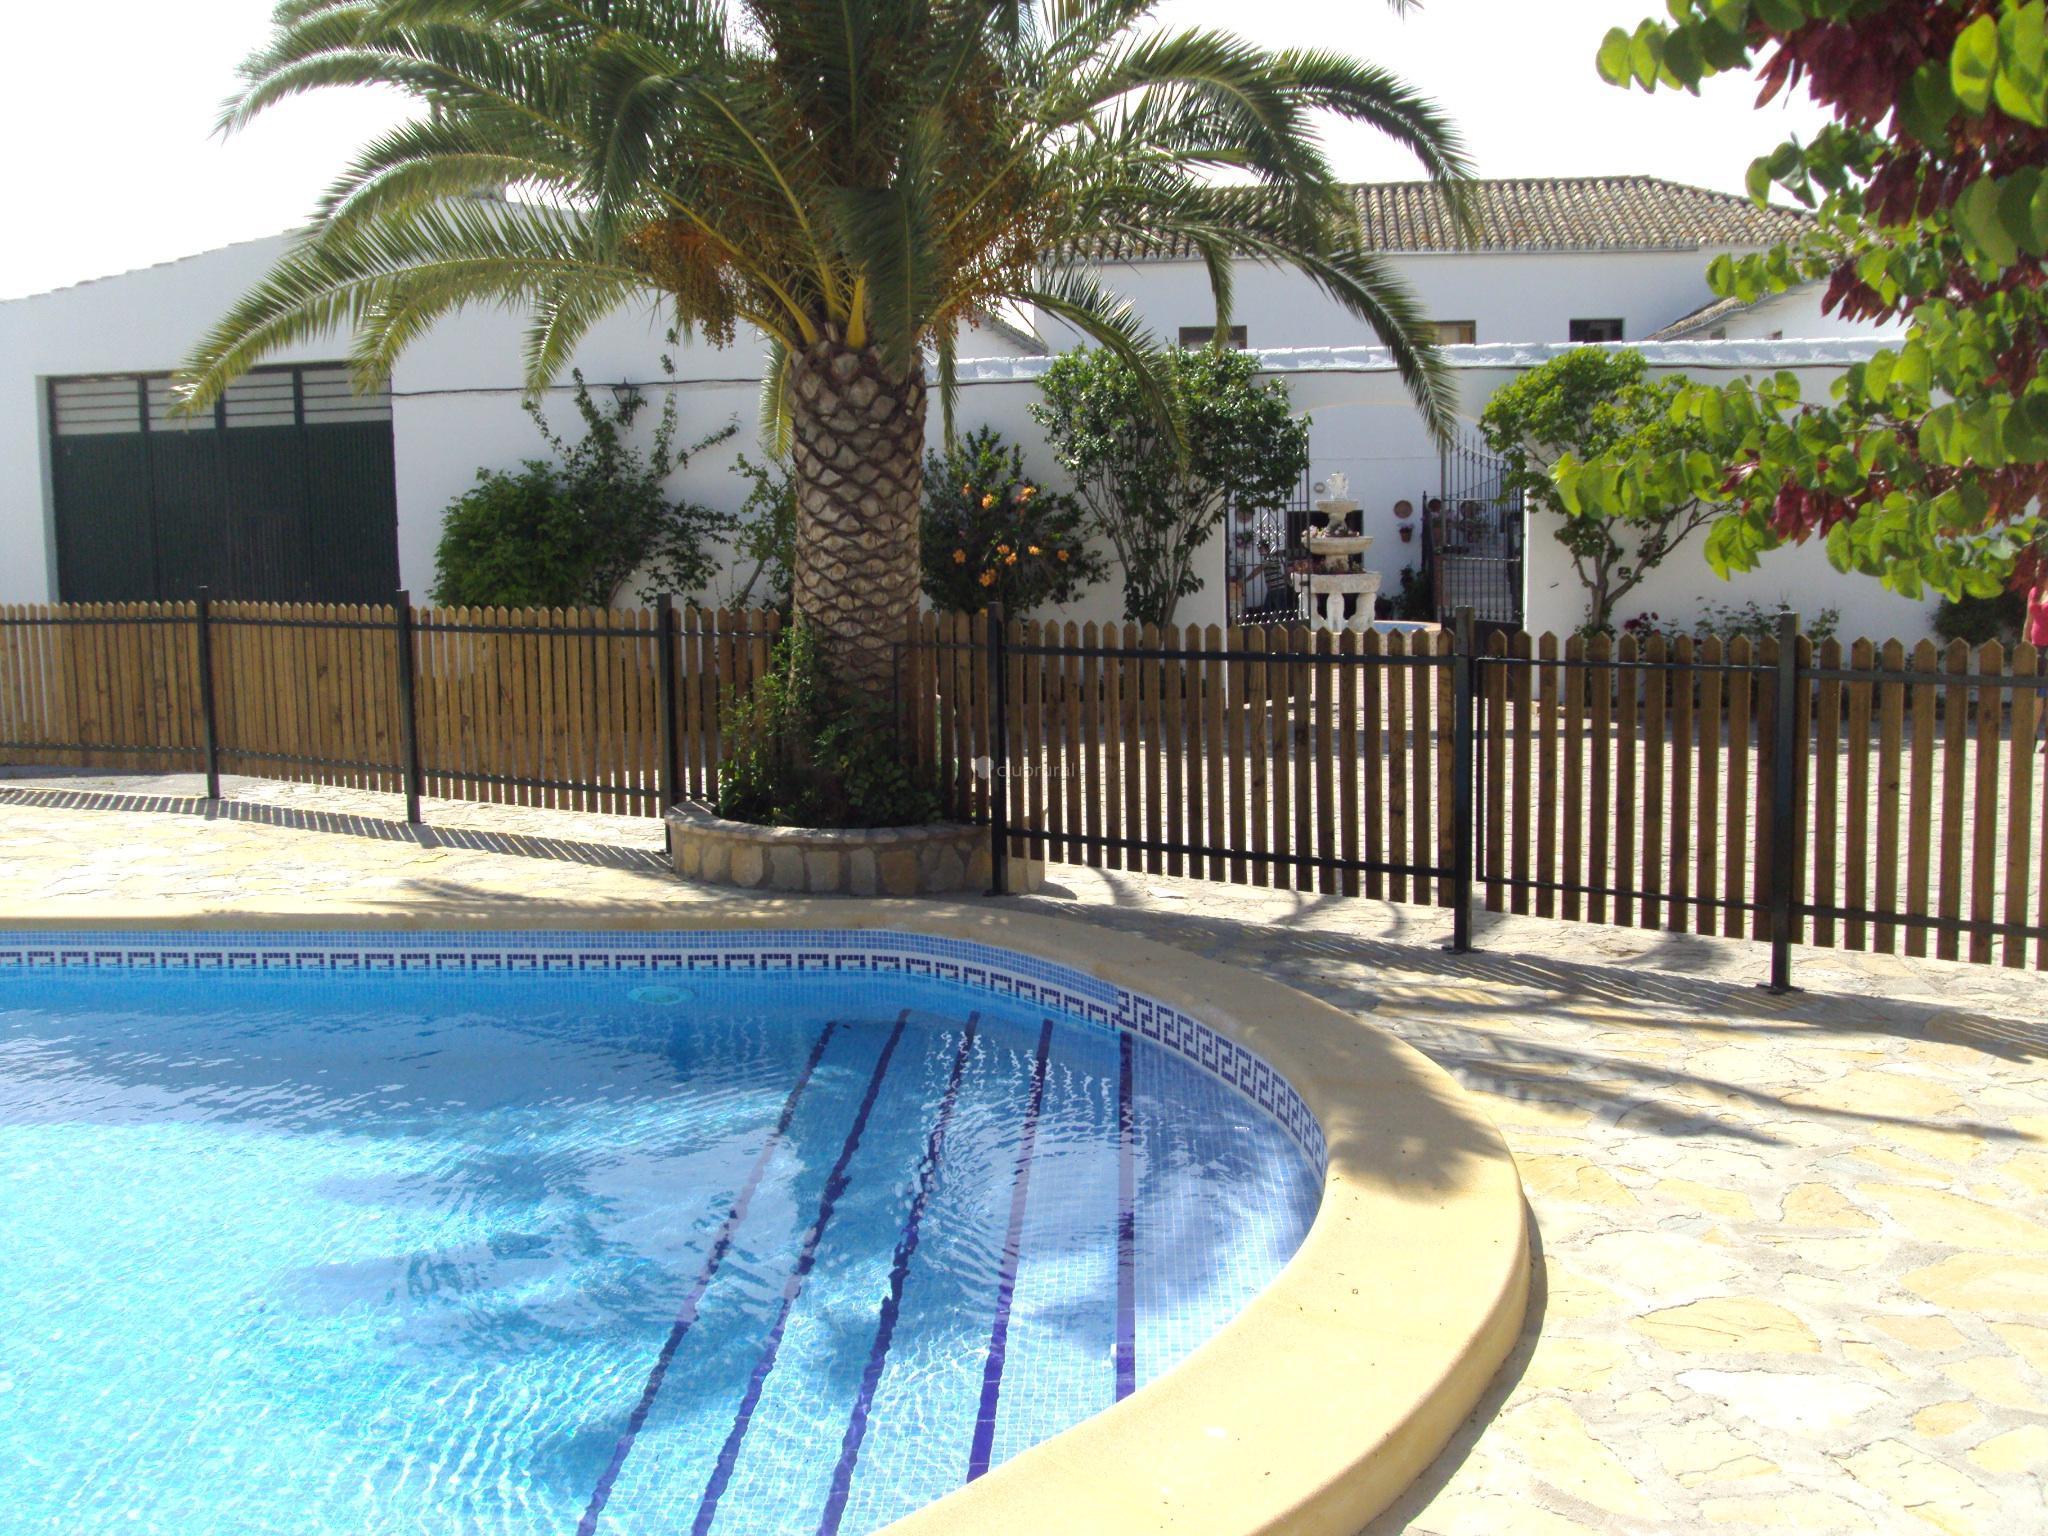 Fotos de hacienda francisco barrera c diz prado del for Barredera piscina